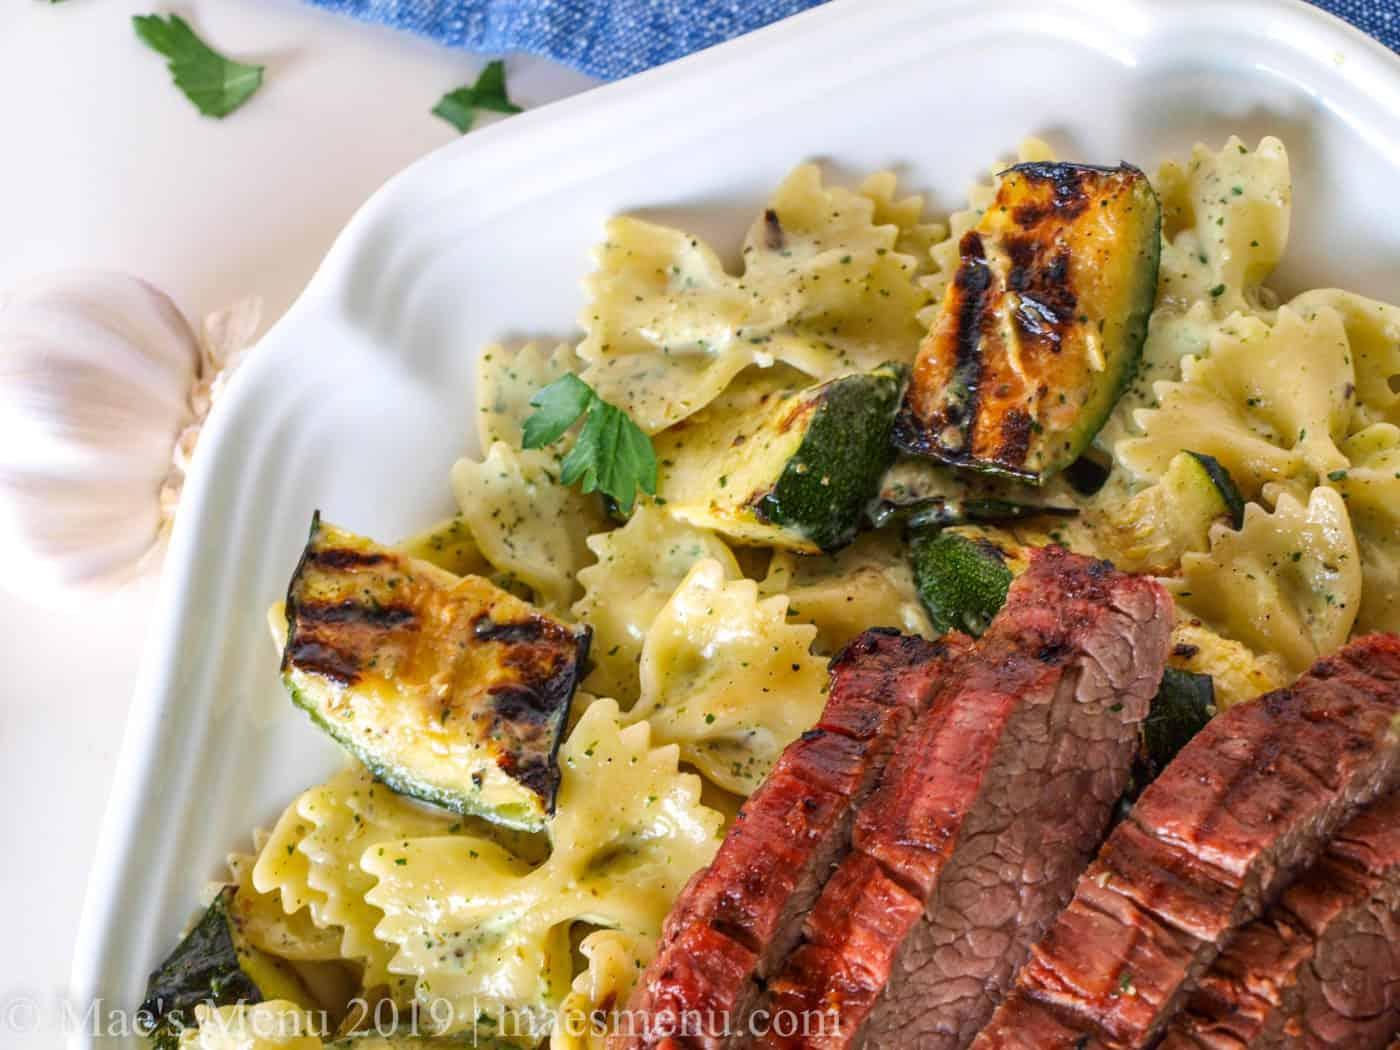 Plate of creamy chimichurri steak pasta.